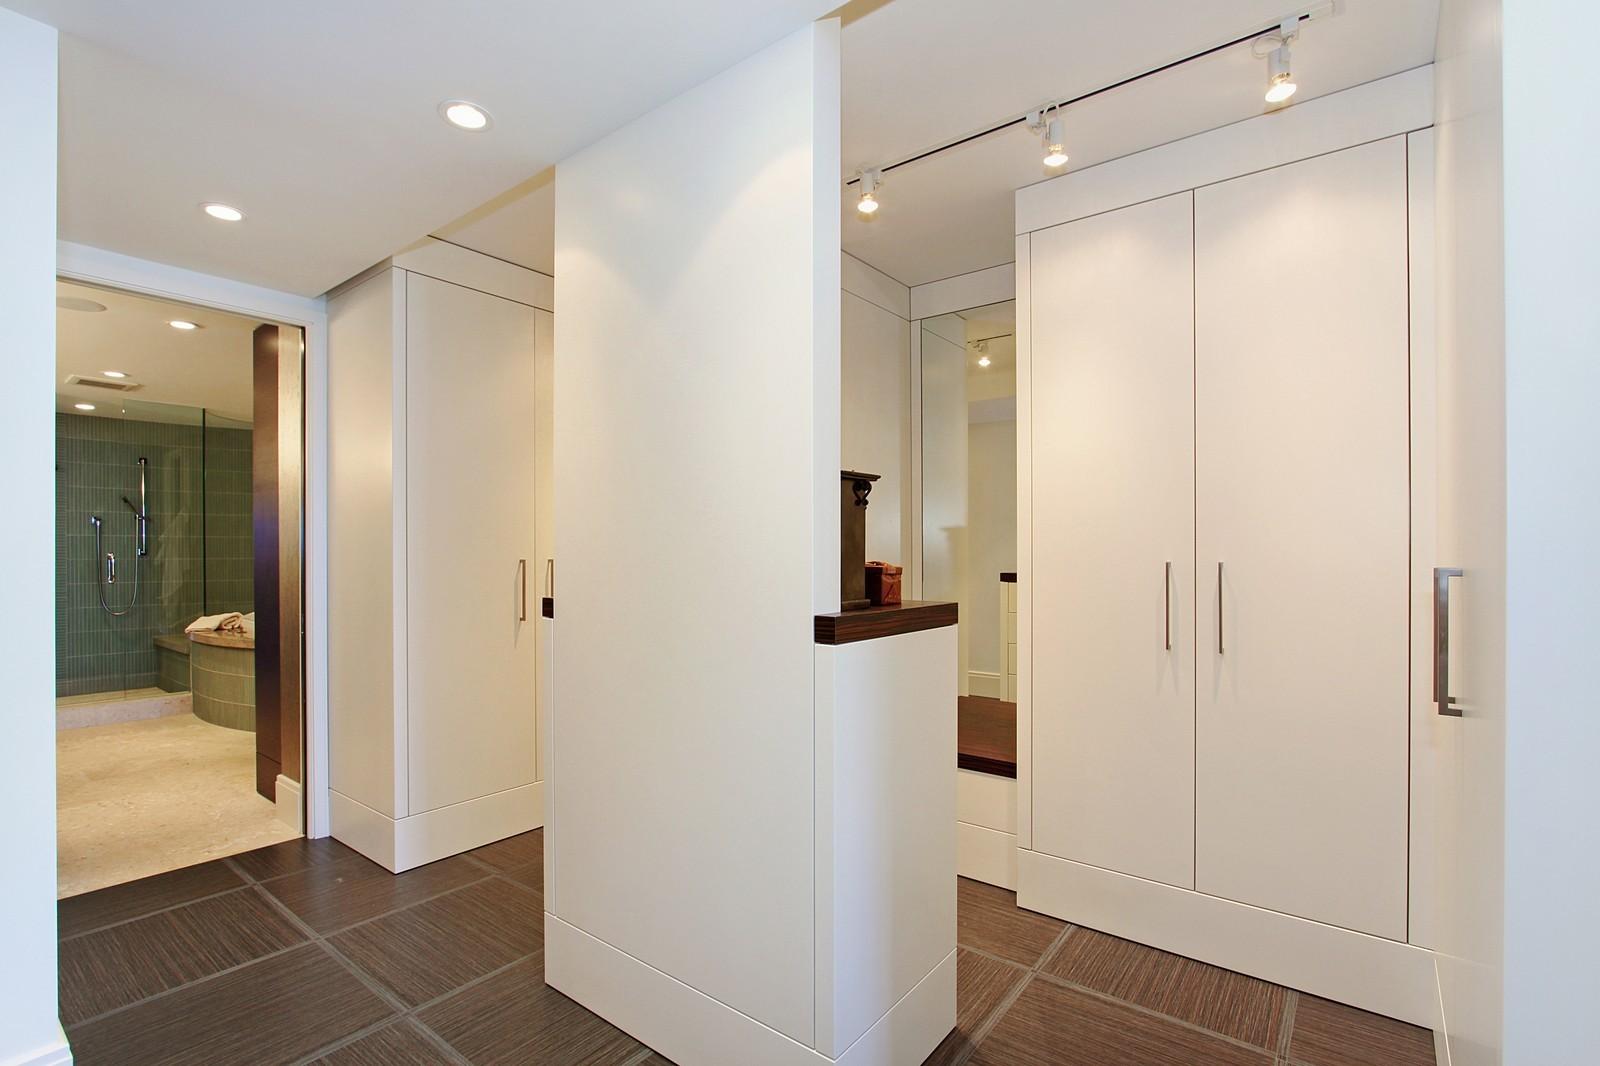 Real Estate Photography - 2001 SE Sailfish Point Blvd, Unit 318, Stuart, FL, 34996 - Master Bedroom Closet